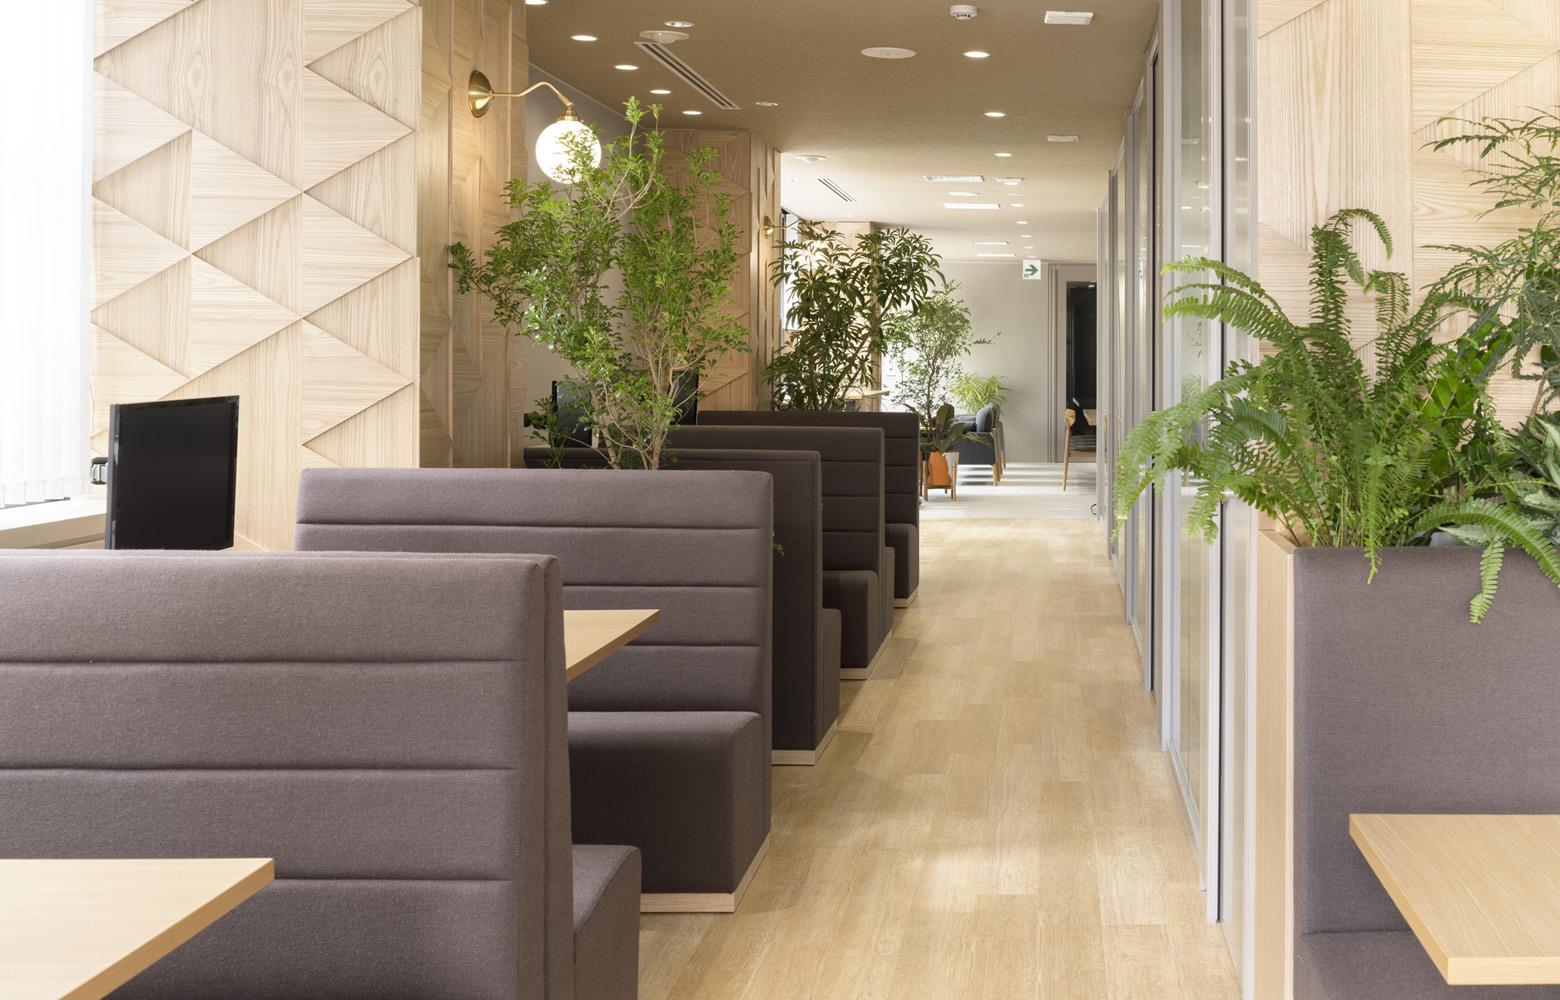 H¹T Shinagawa Office Share Office_4 デザイン・レイアウト事例